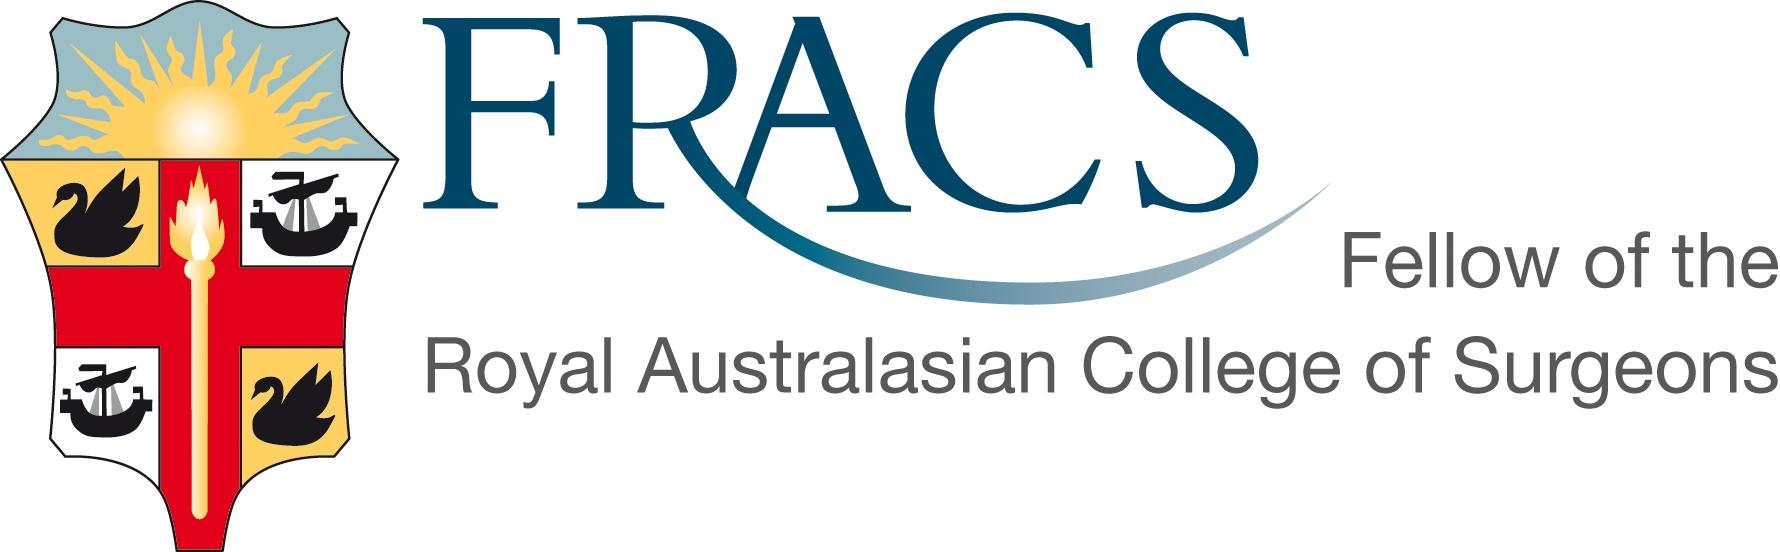 fracs_logo_a_rgb.jpg